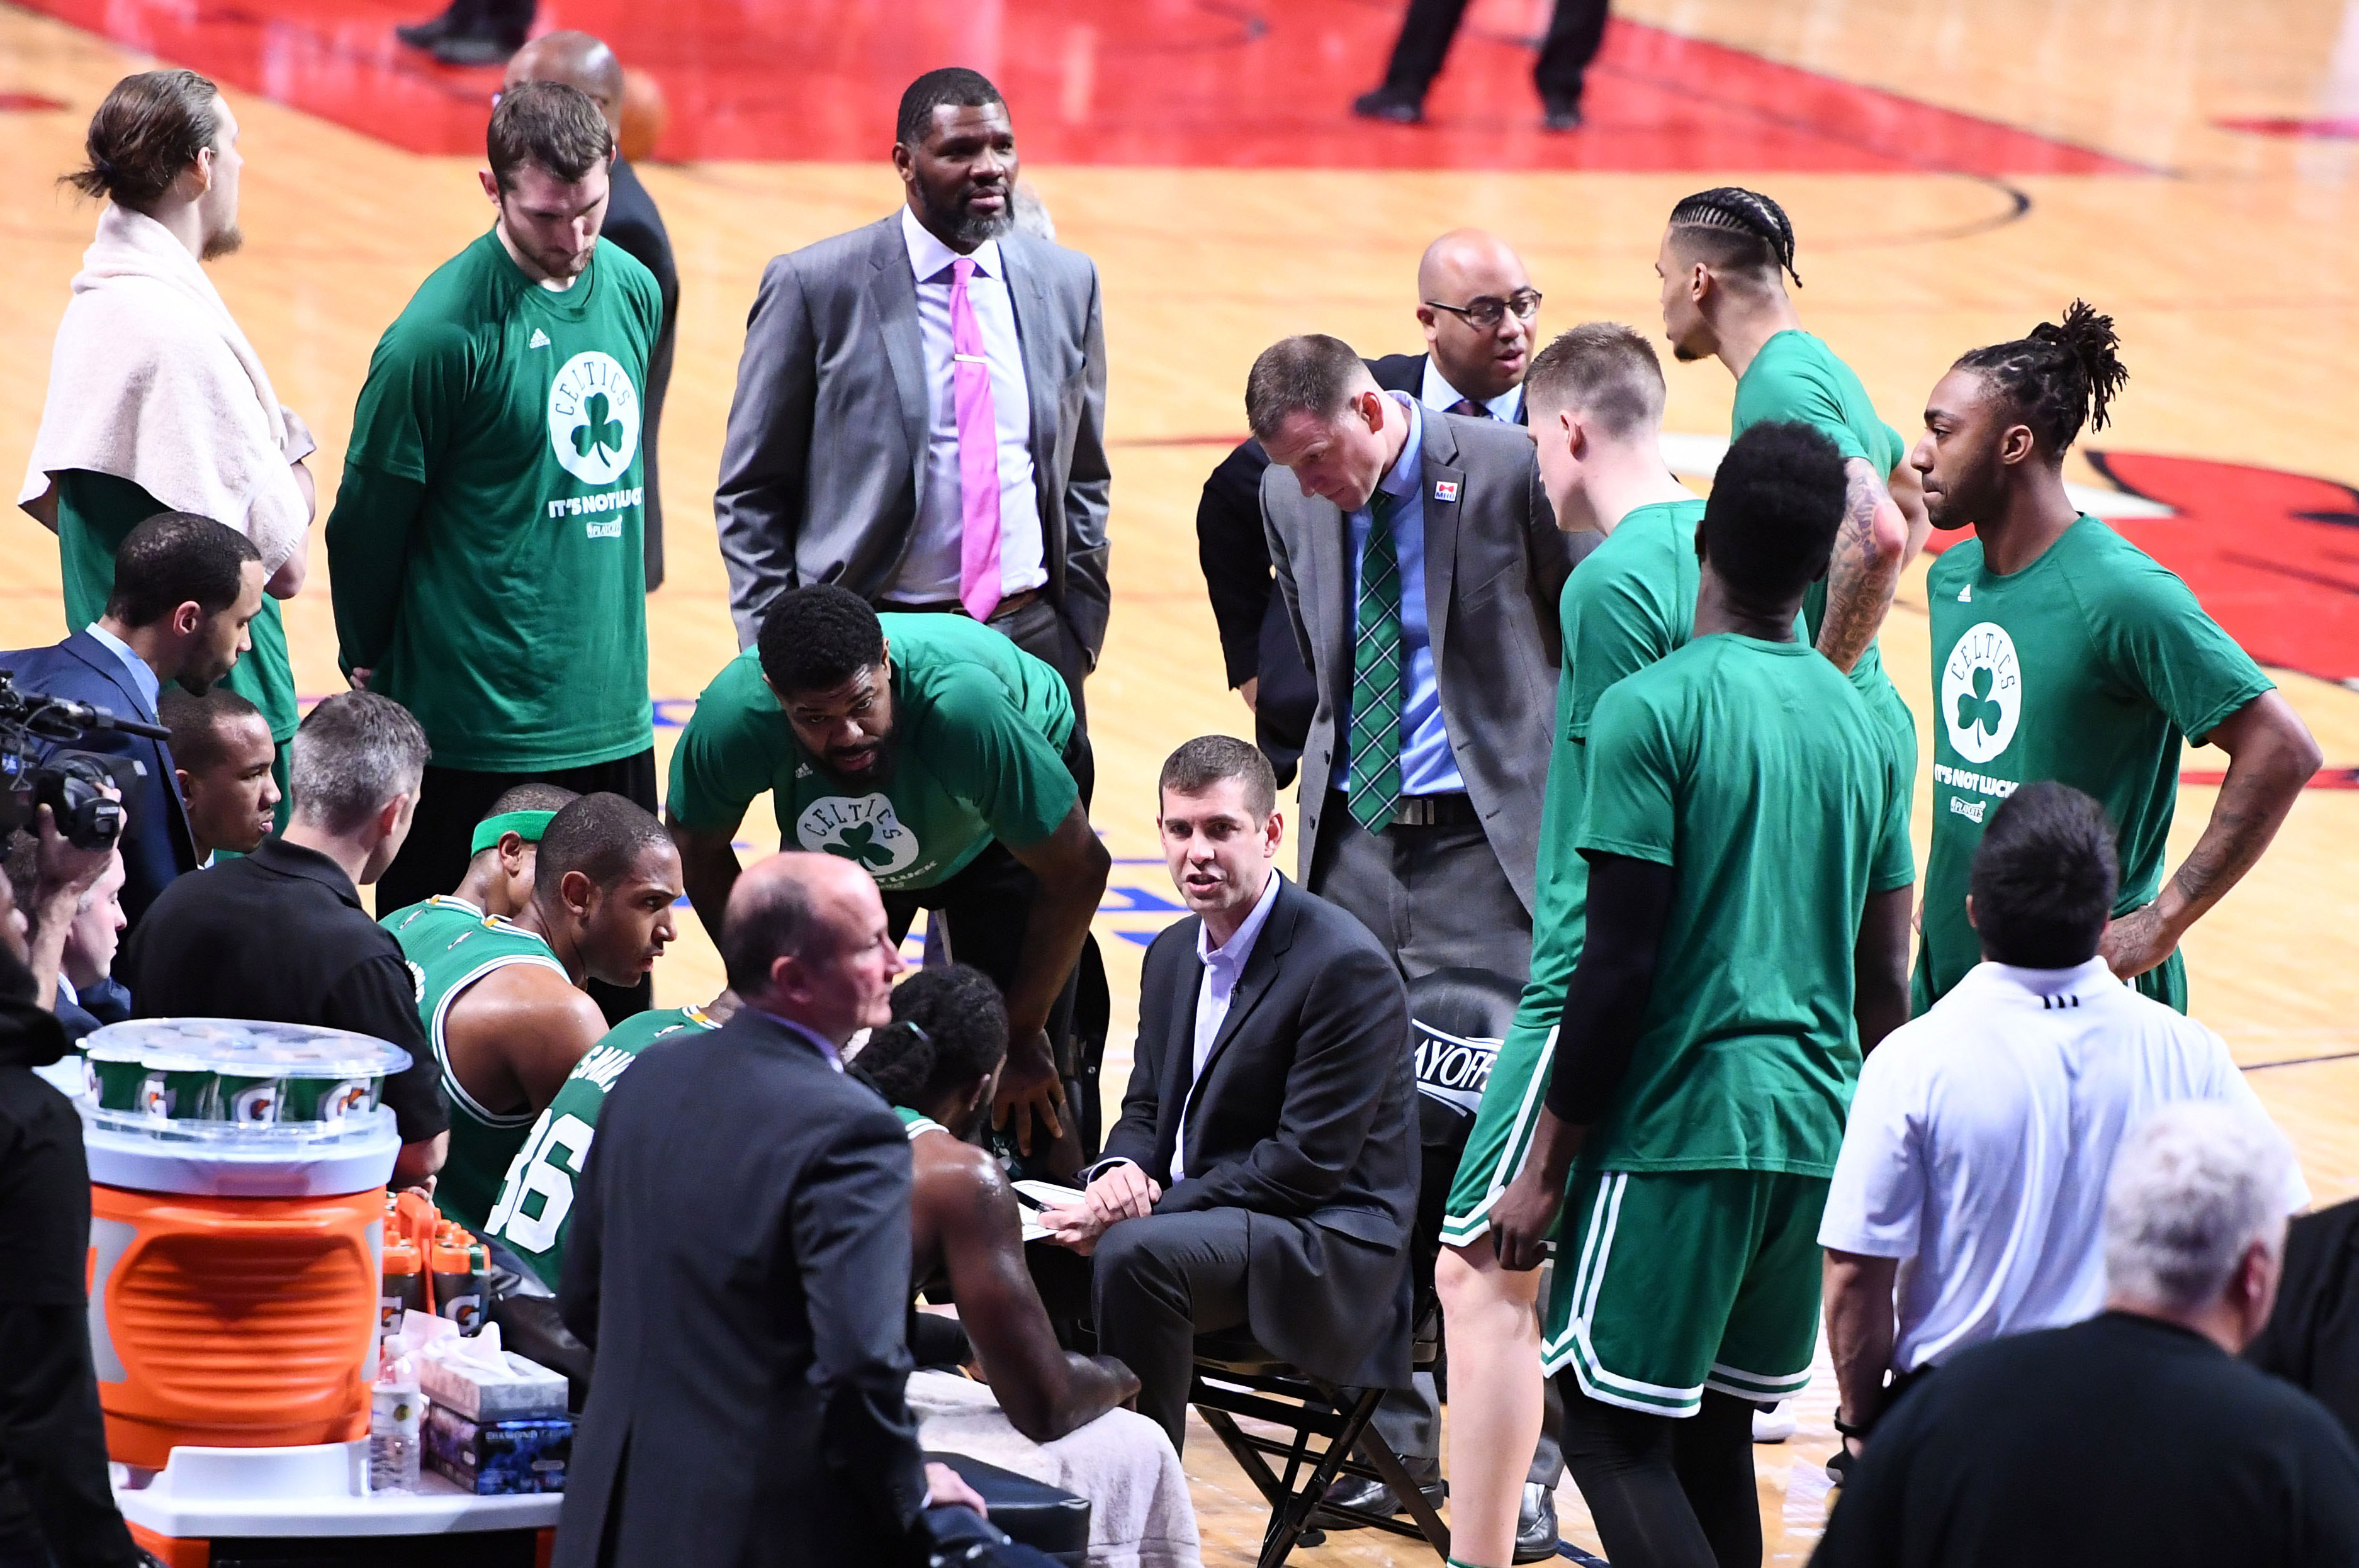 10028381-nba-playoffs-boston-celtics-at-chicago-bulls